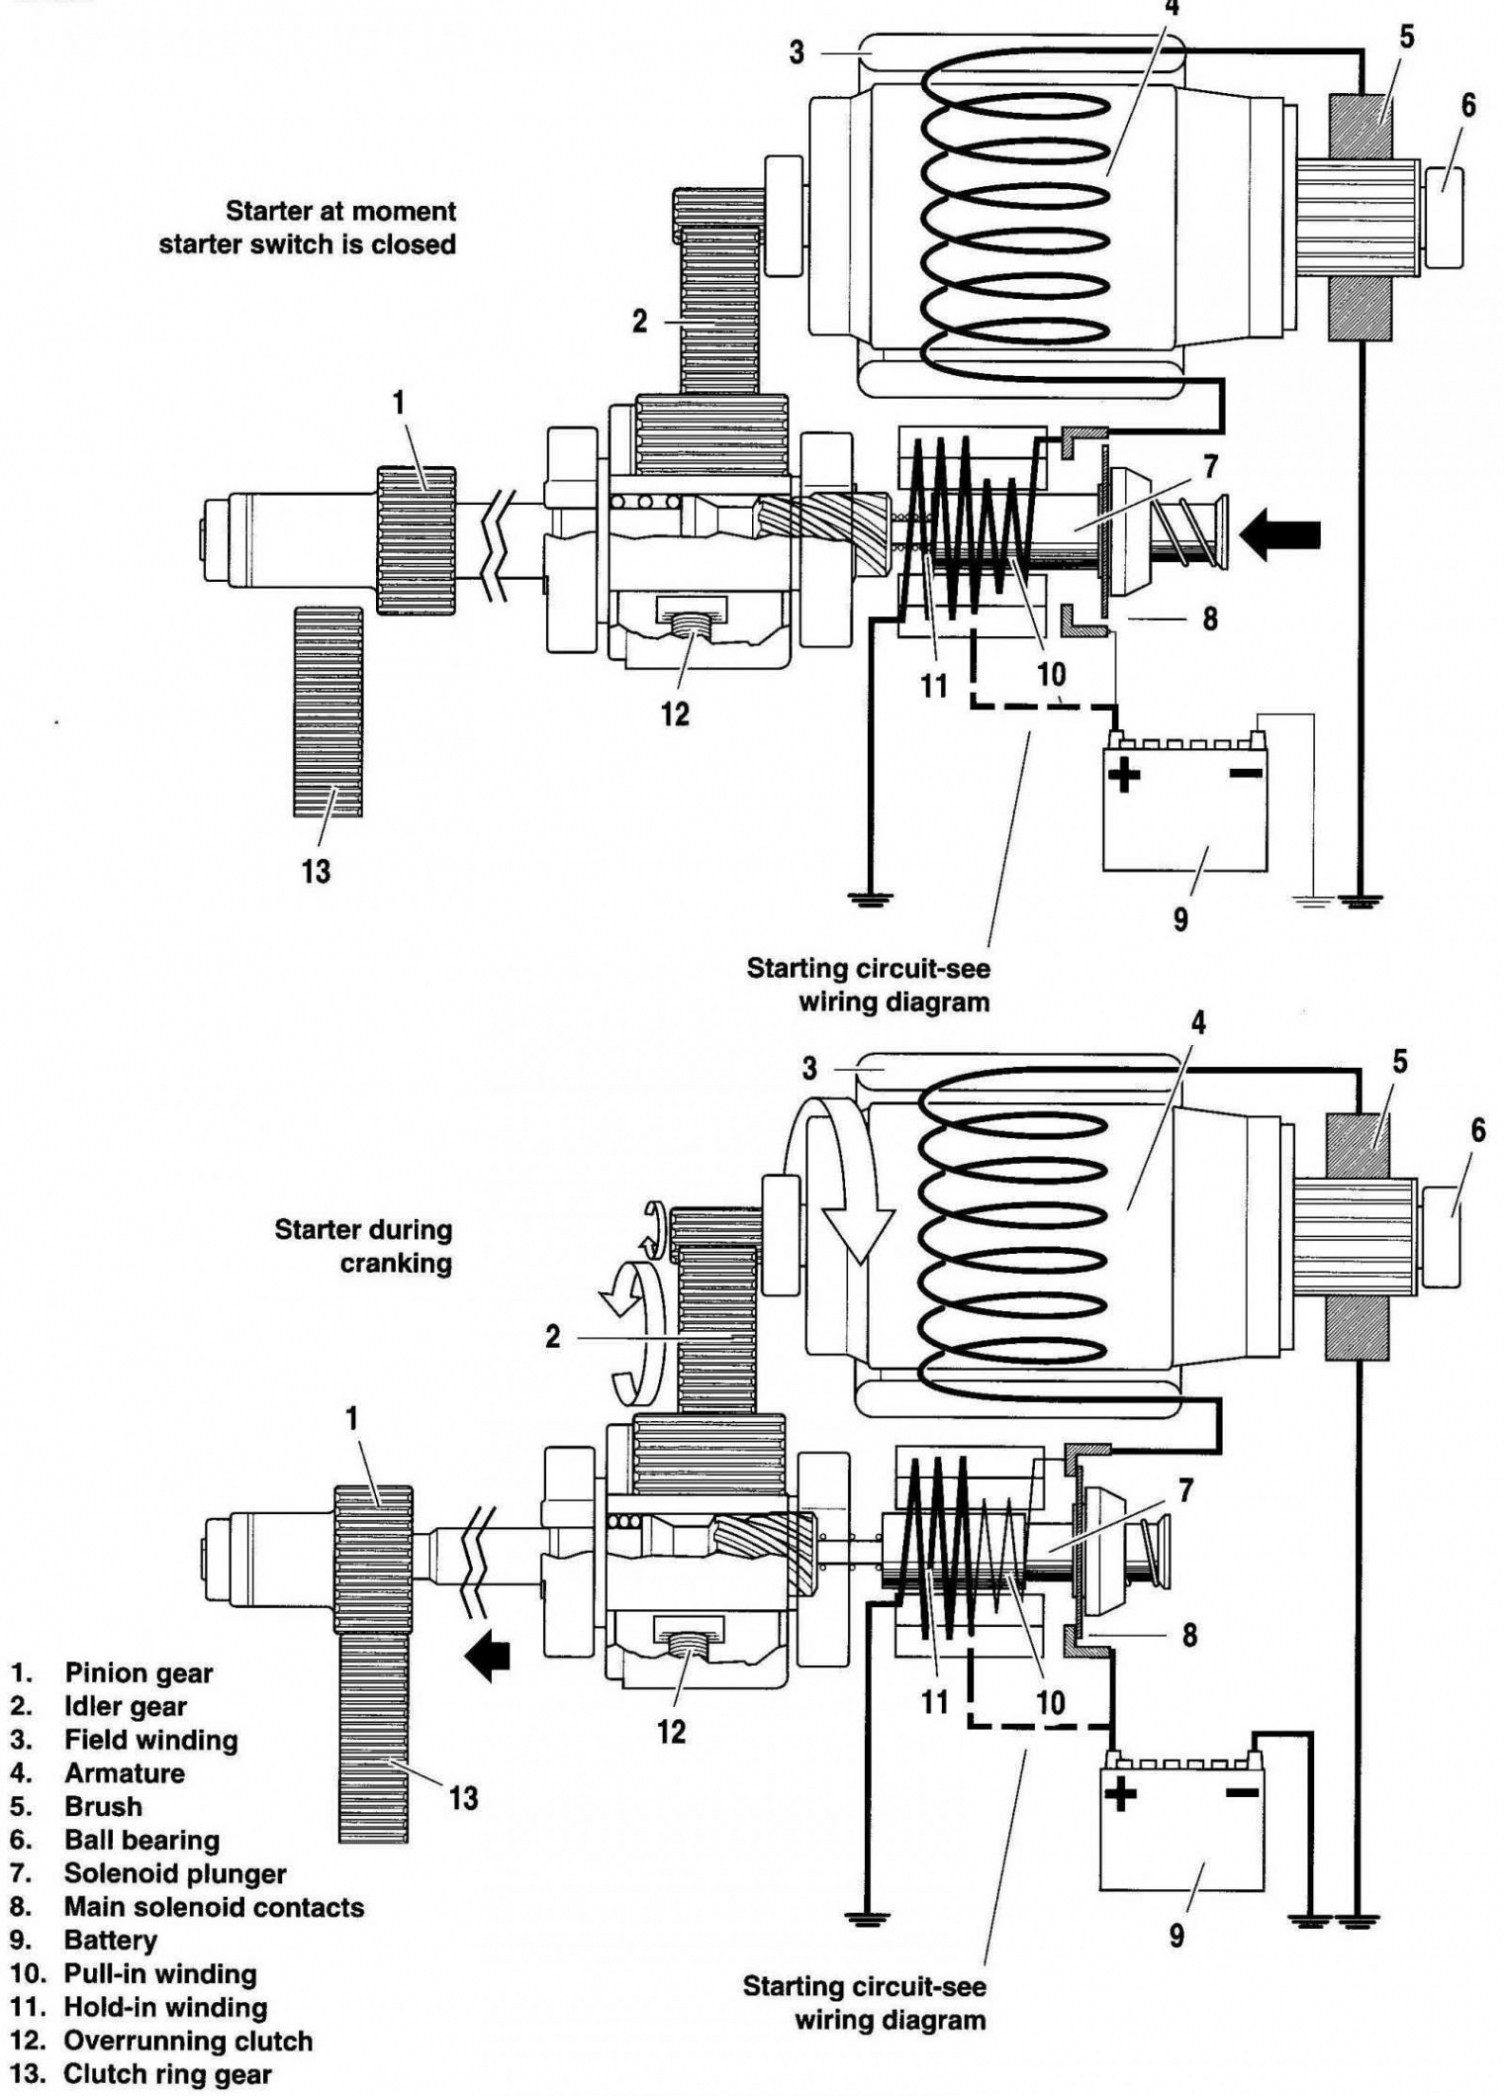 Starter Solenoid Diagram — Daytonva150 - Mopar Starter Relay Wiring Diagram